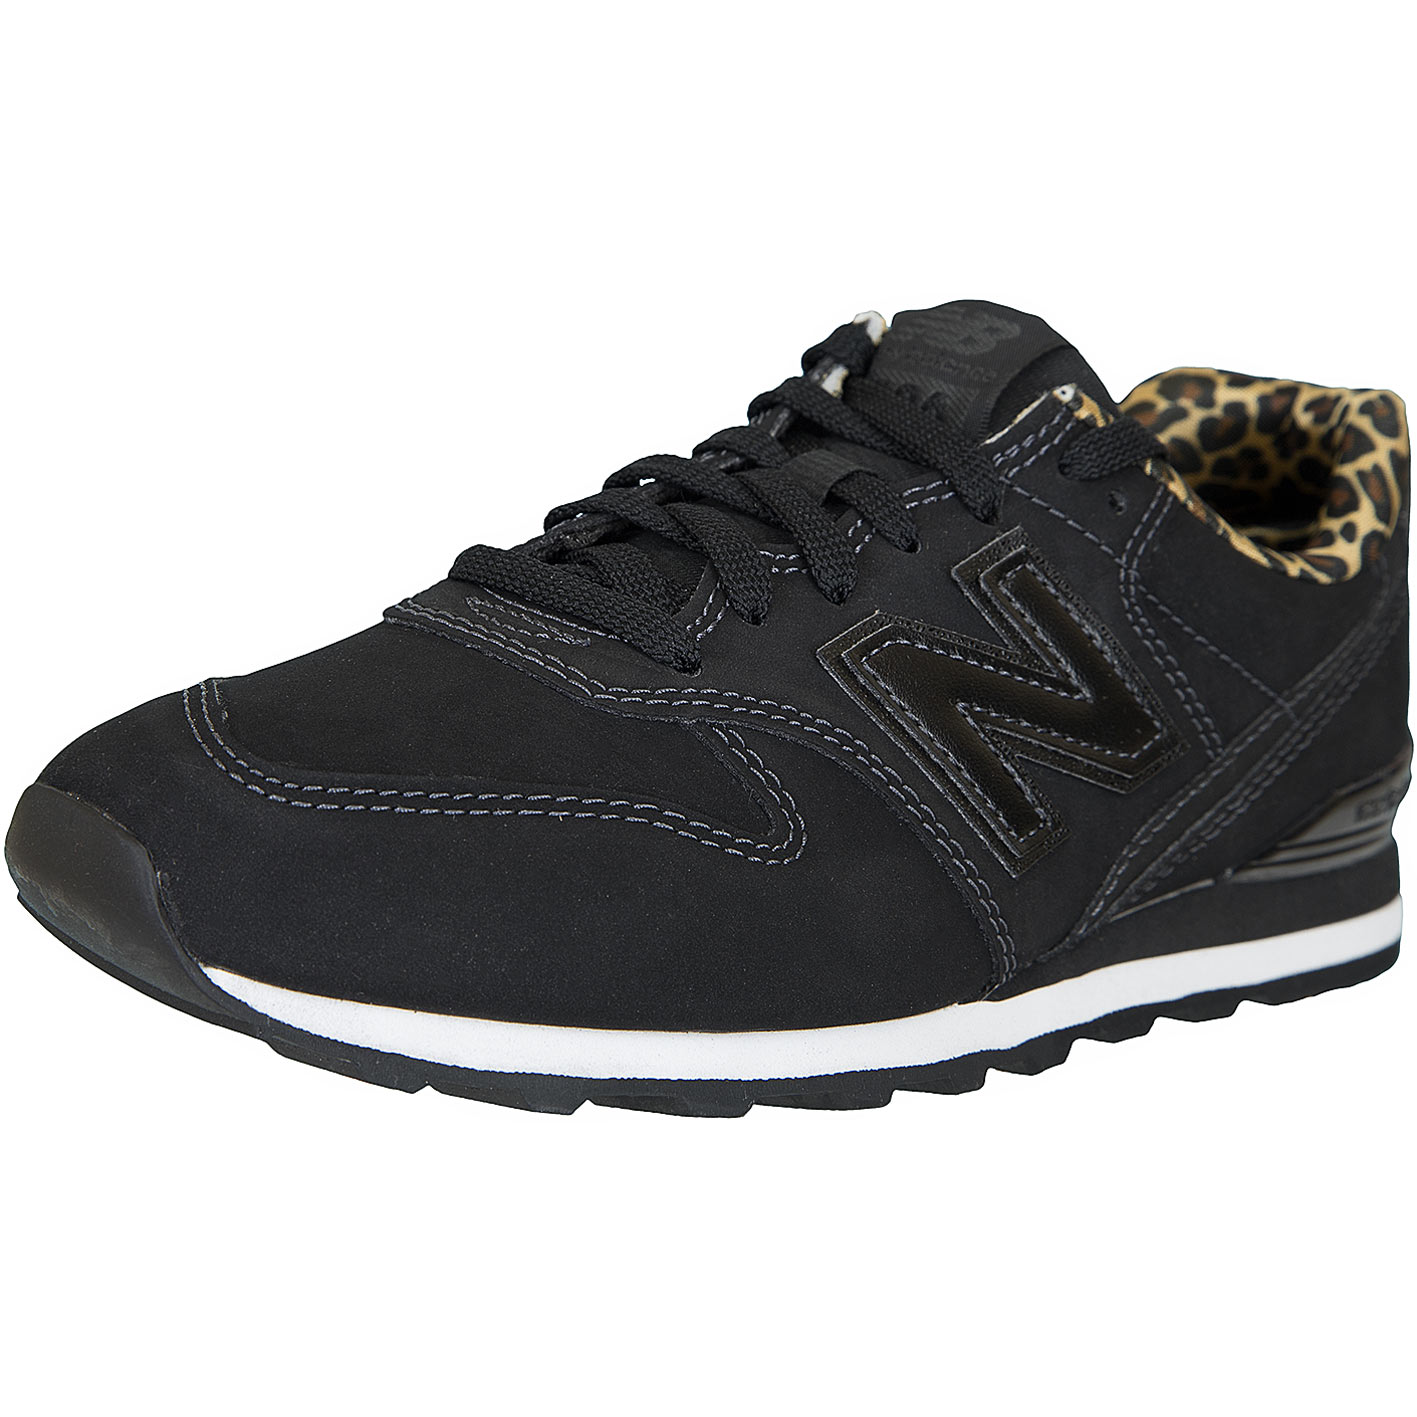 New Balance Damen Sneaker 996 schwarz